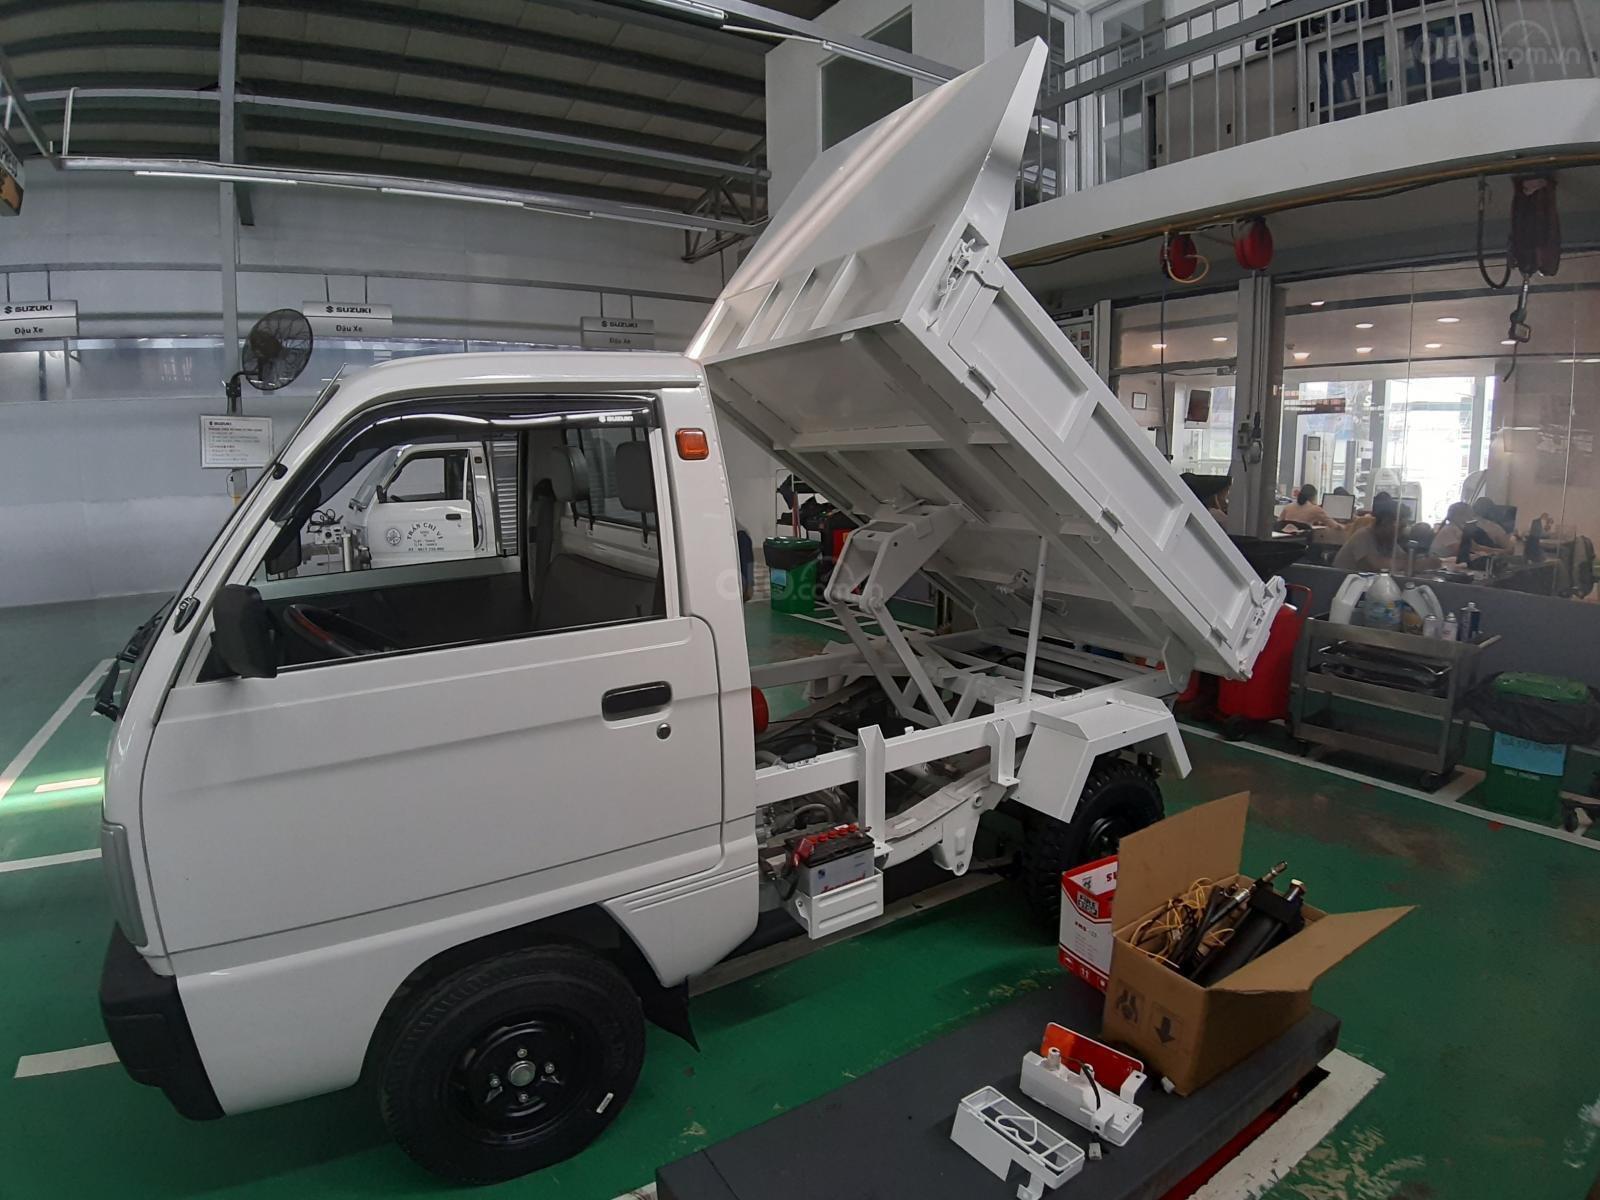 Xe tải Suzuki Ben giá hạt dẻ (4)